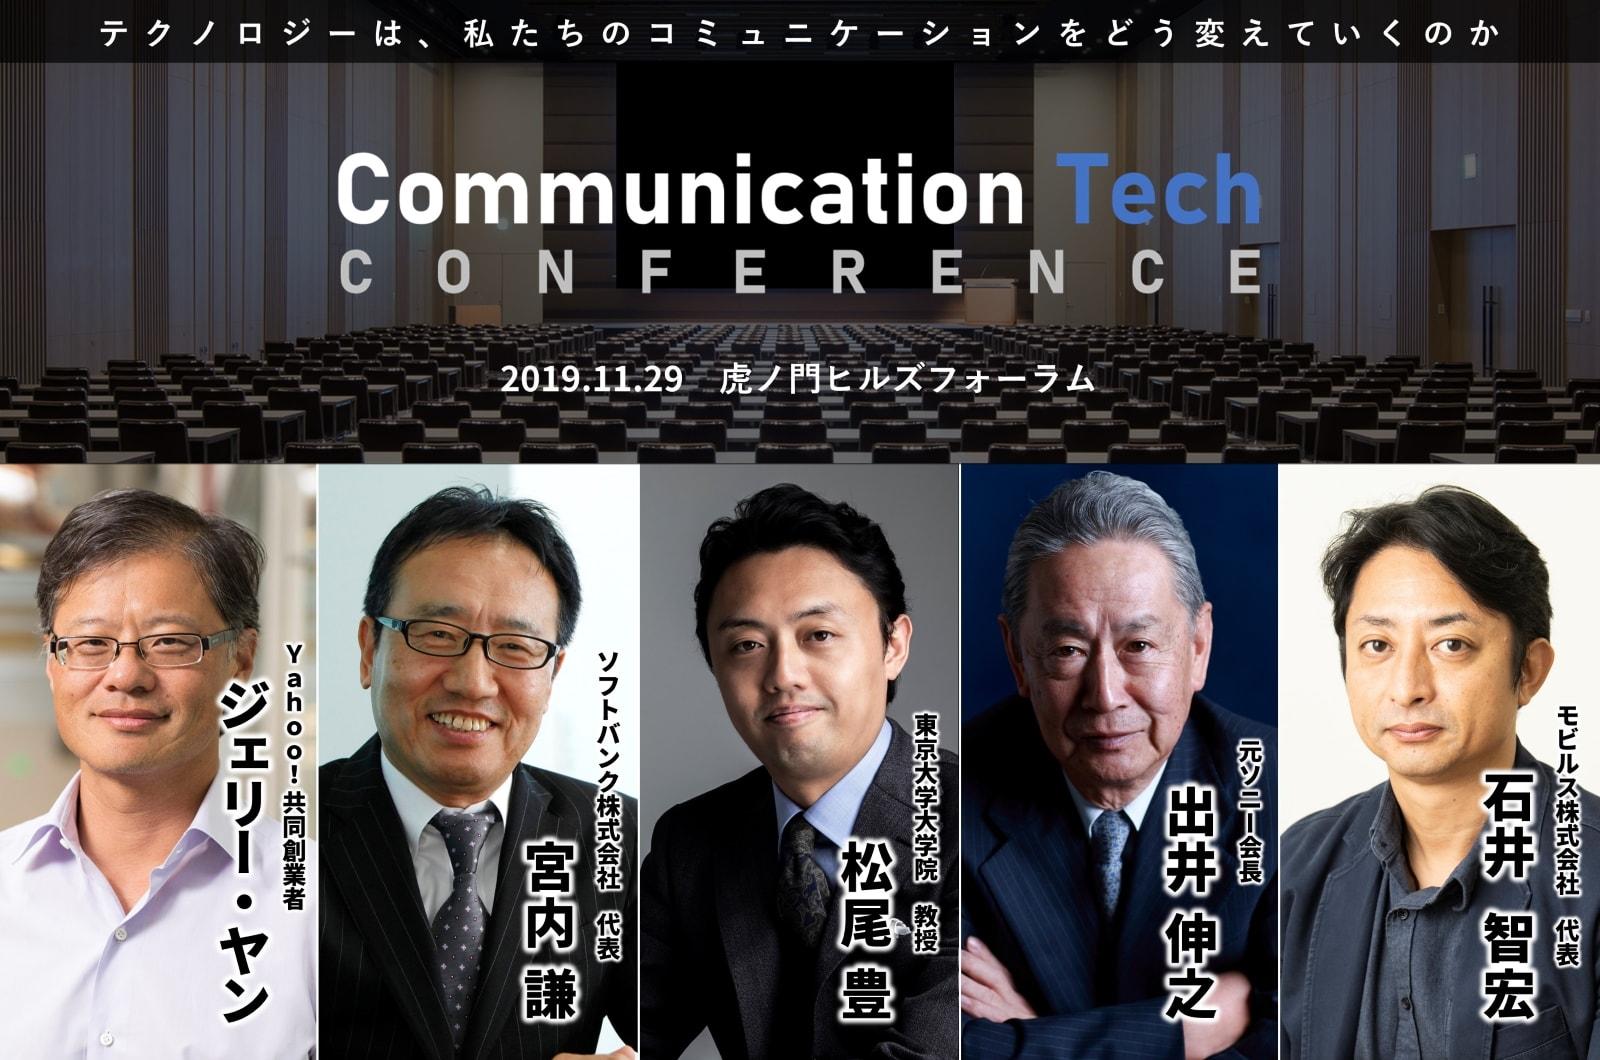 Communication Tech Conference 2019